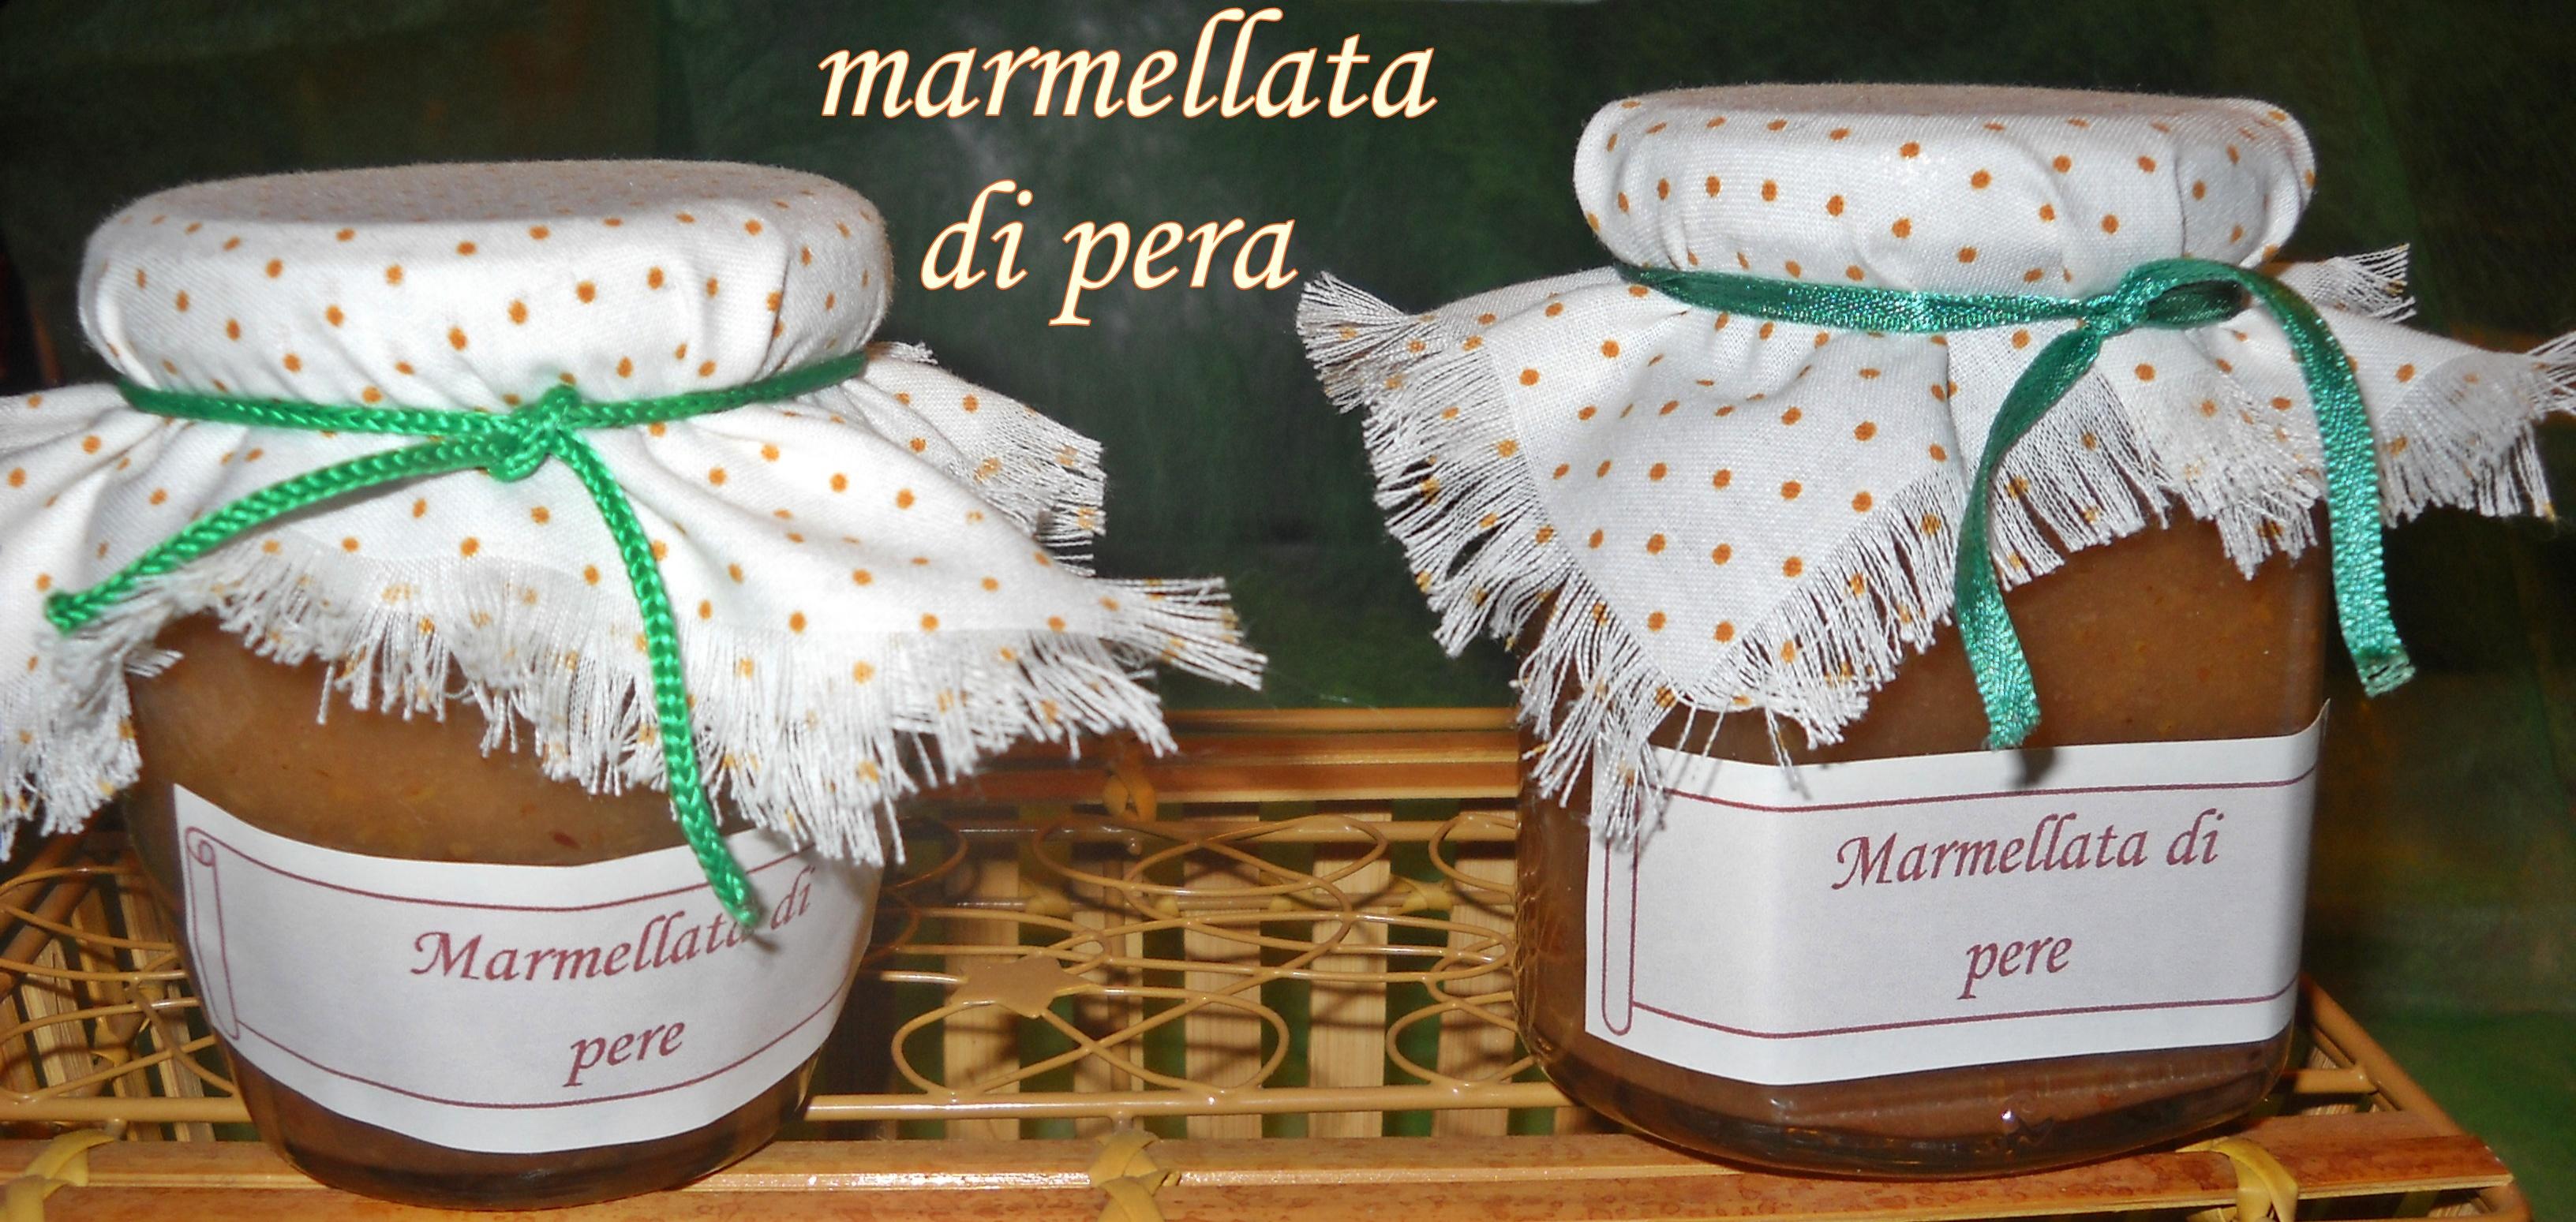 marmellata di pera